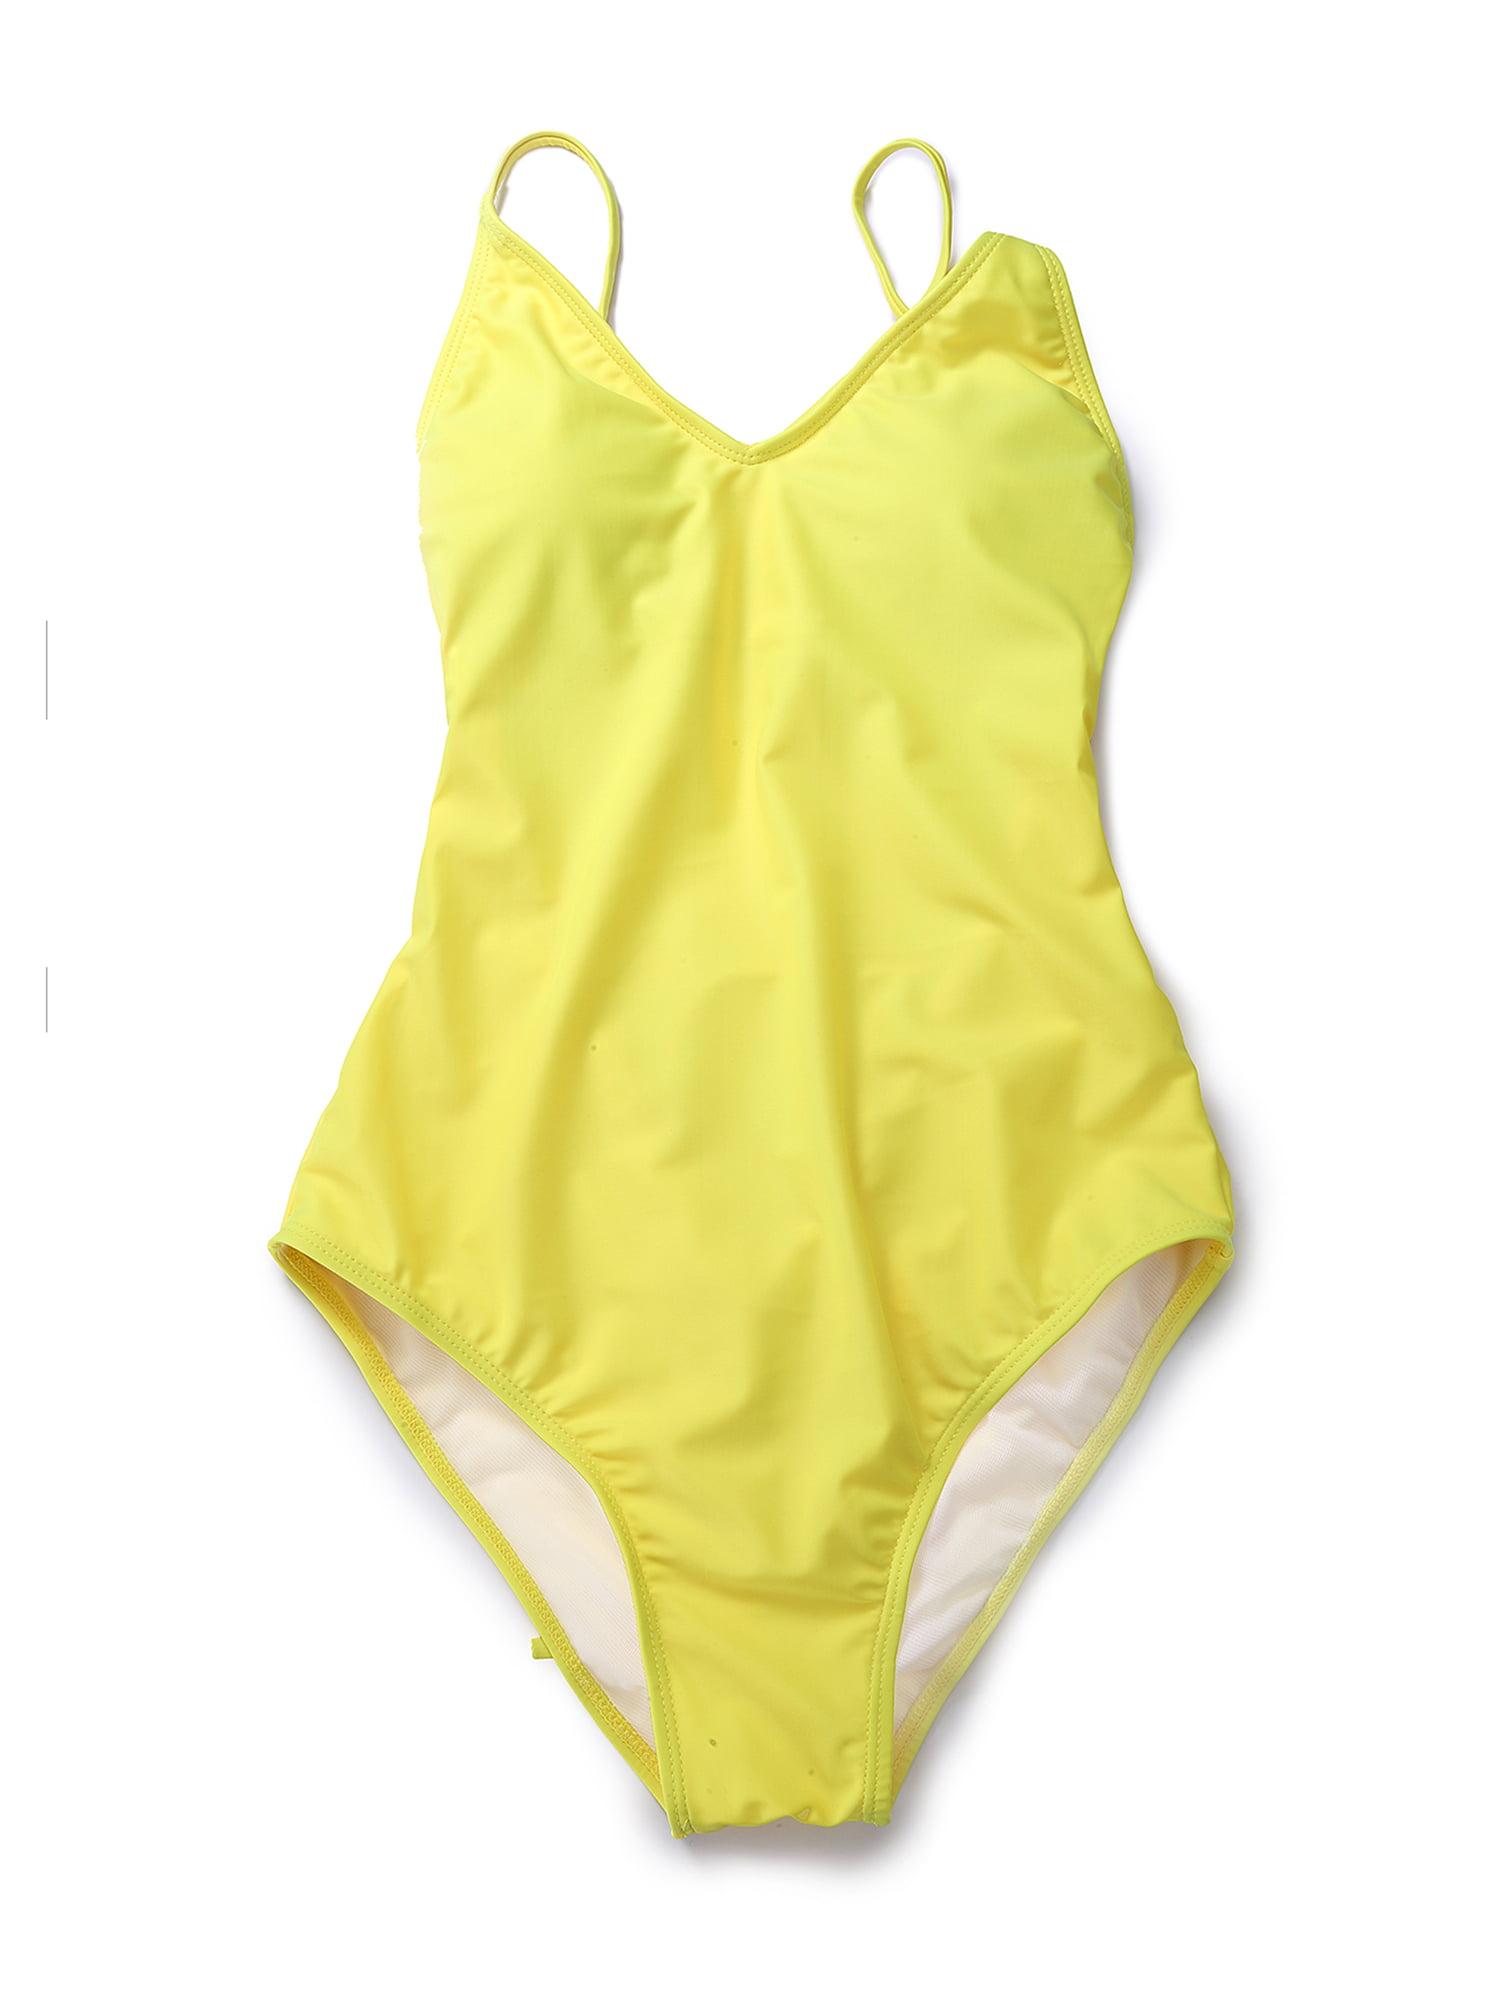 Womens slim swimsuit Women Plus Size Solid Tummy Control One Piece Swimsuit Deep V Ruched Sleeveless Bathing Suit Backless Push Up Padded Bra Monokini Swimwear Stretchy Bikini Beachwear Bodysuit One